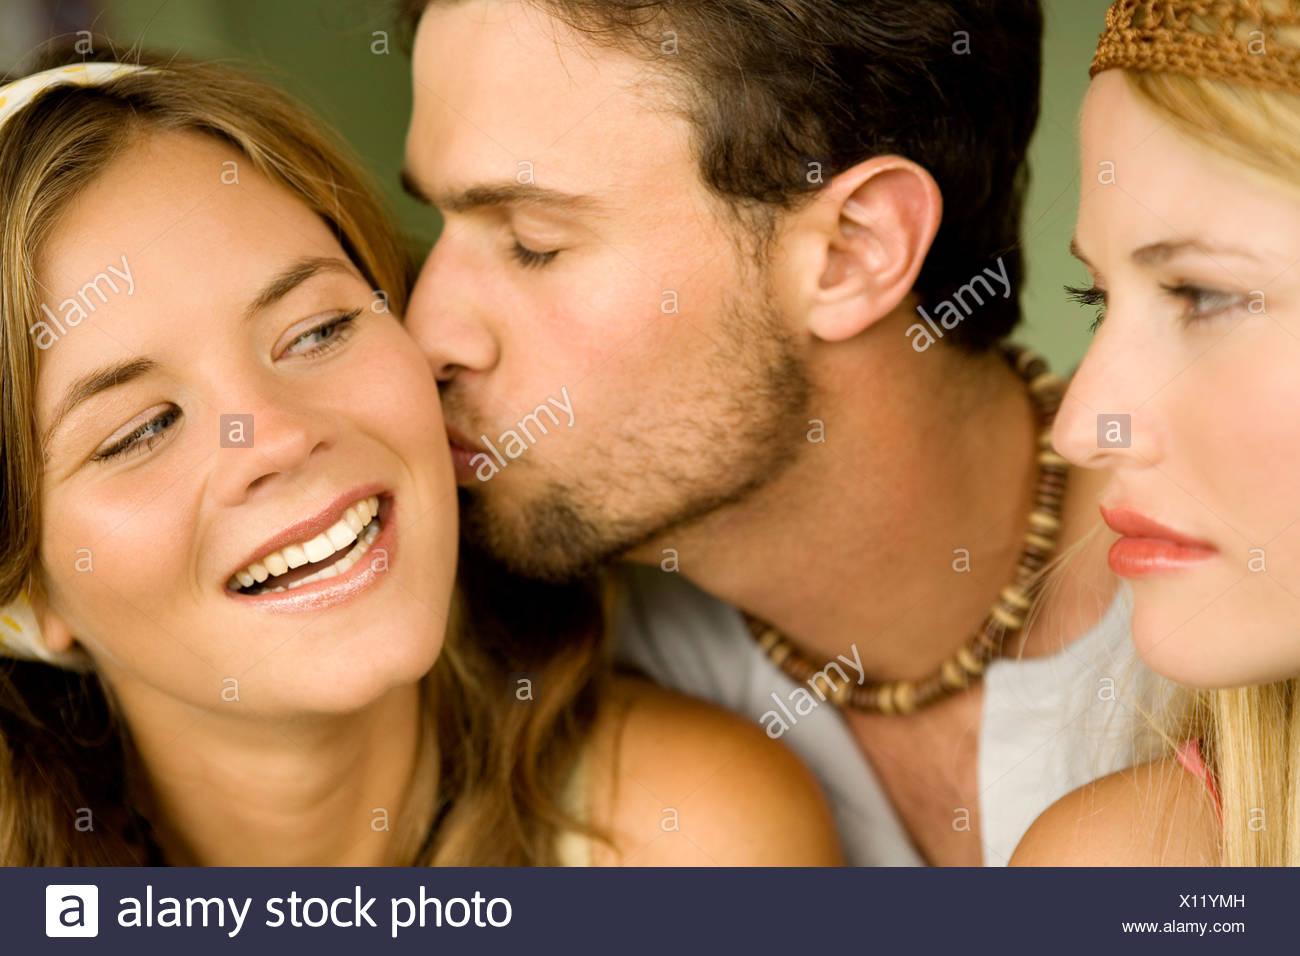 real teens kissing tia and